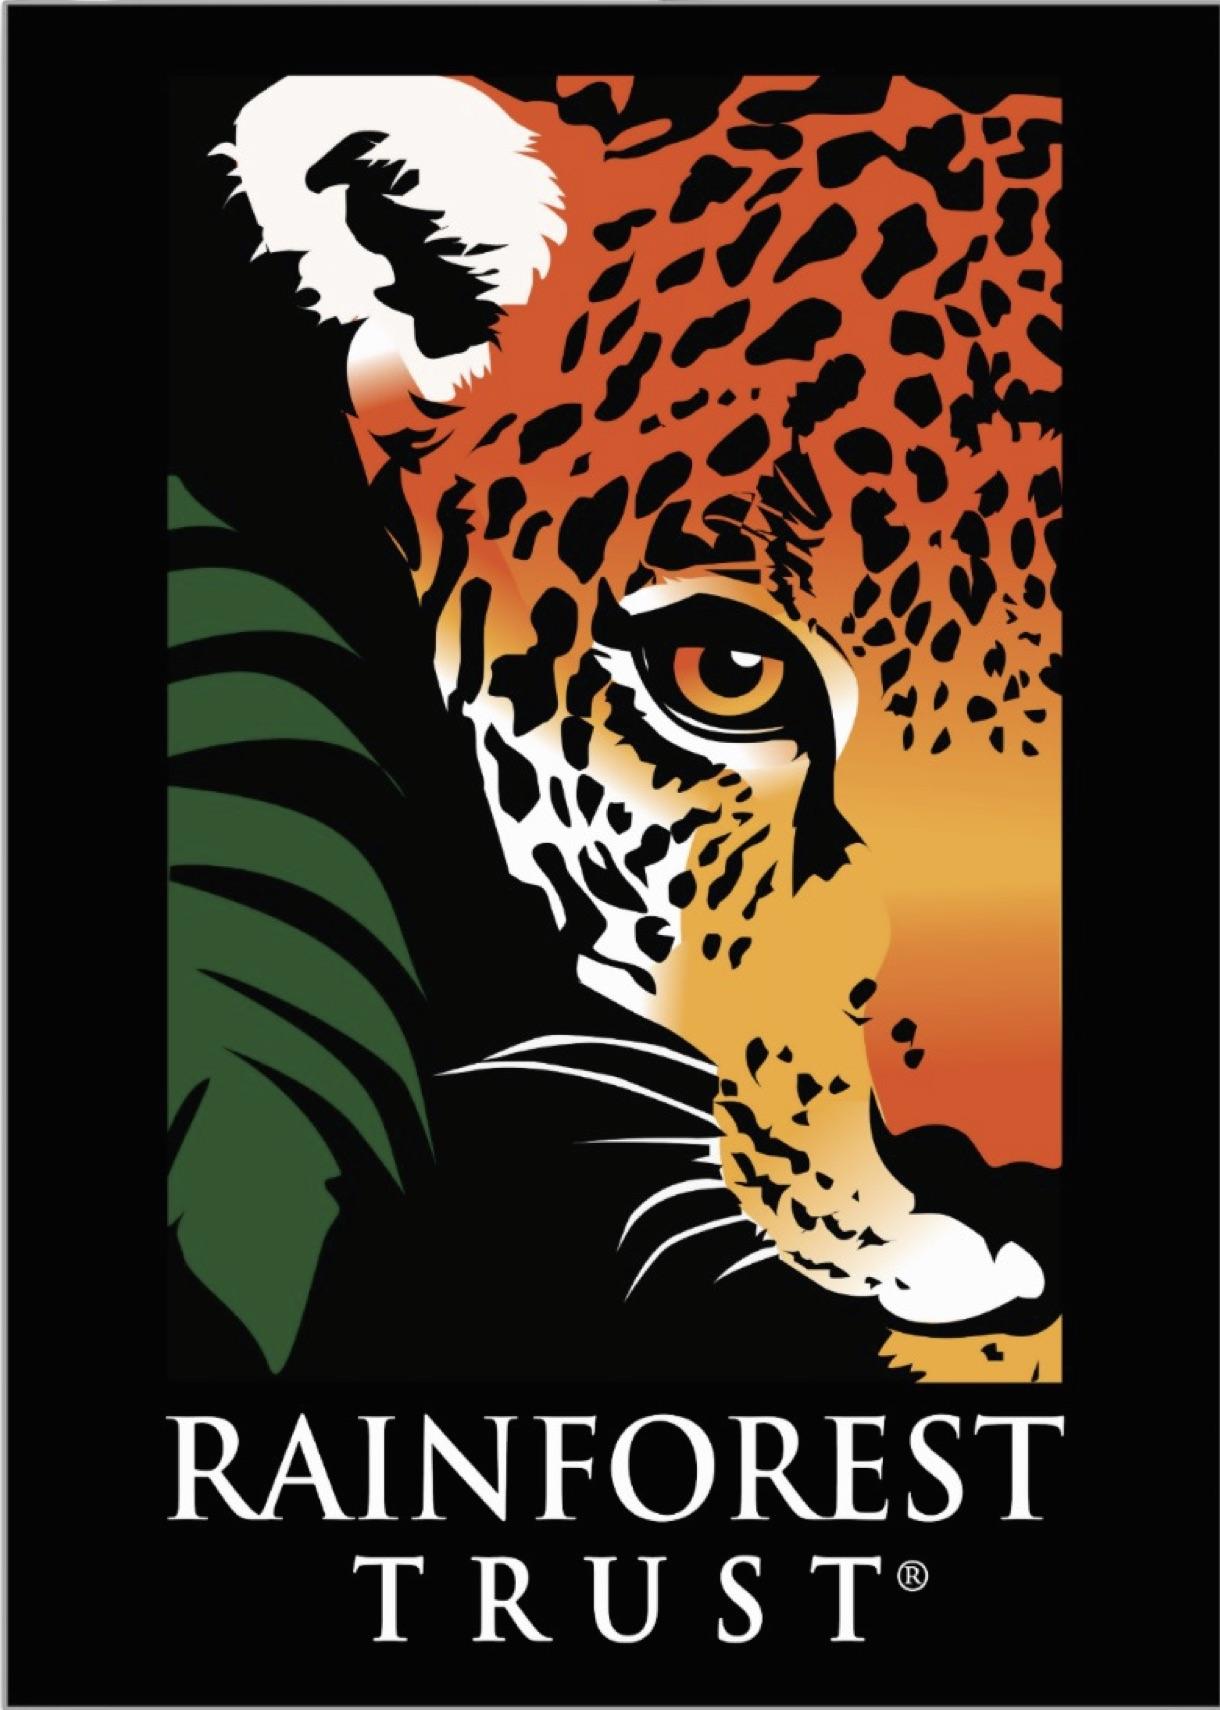 rainforest_trust_logo copy.jpg